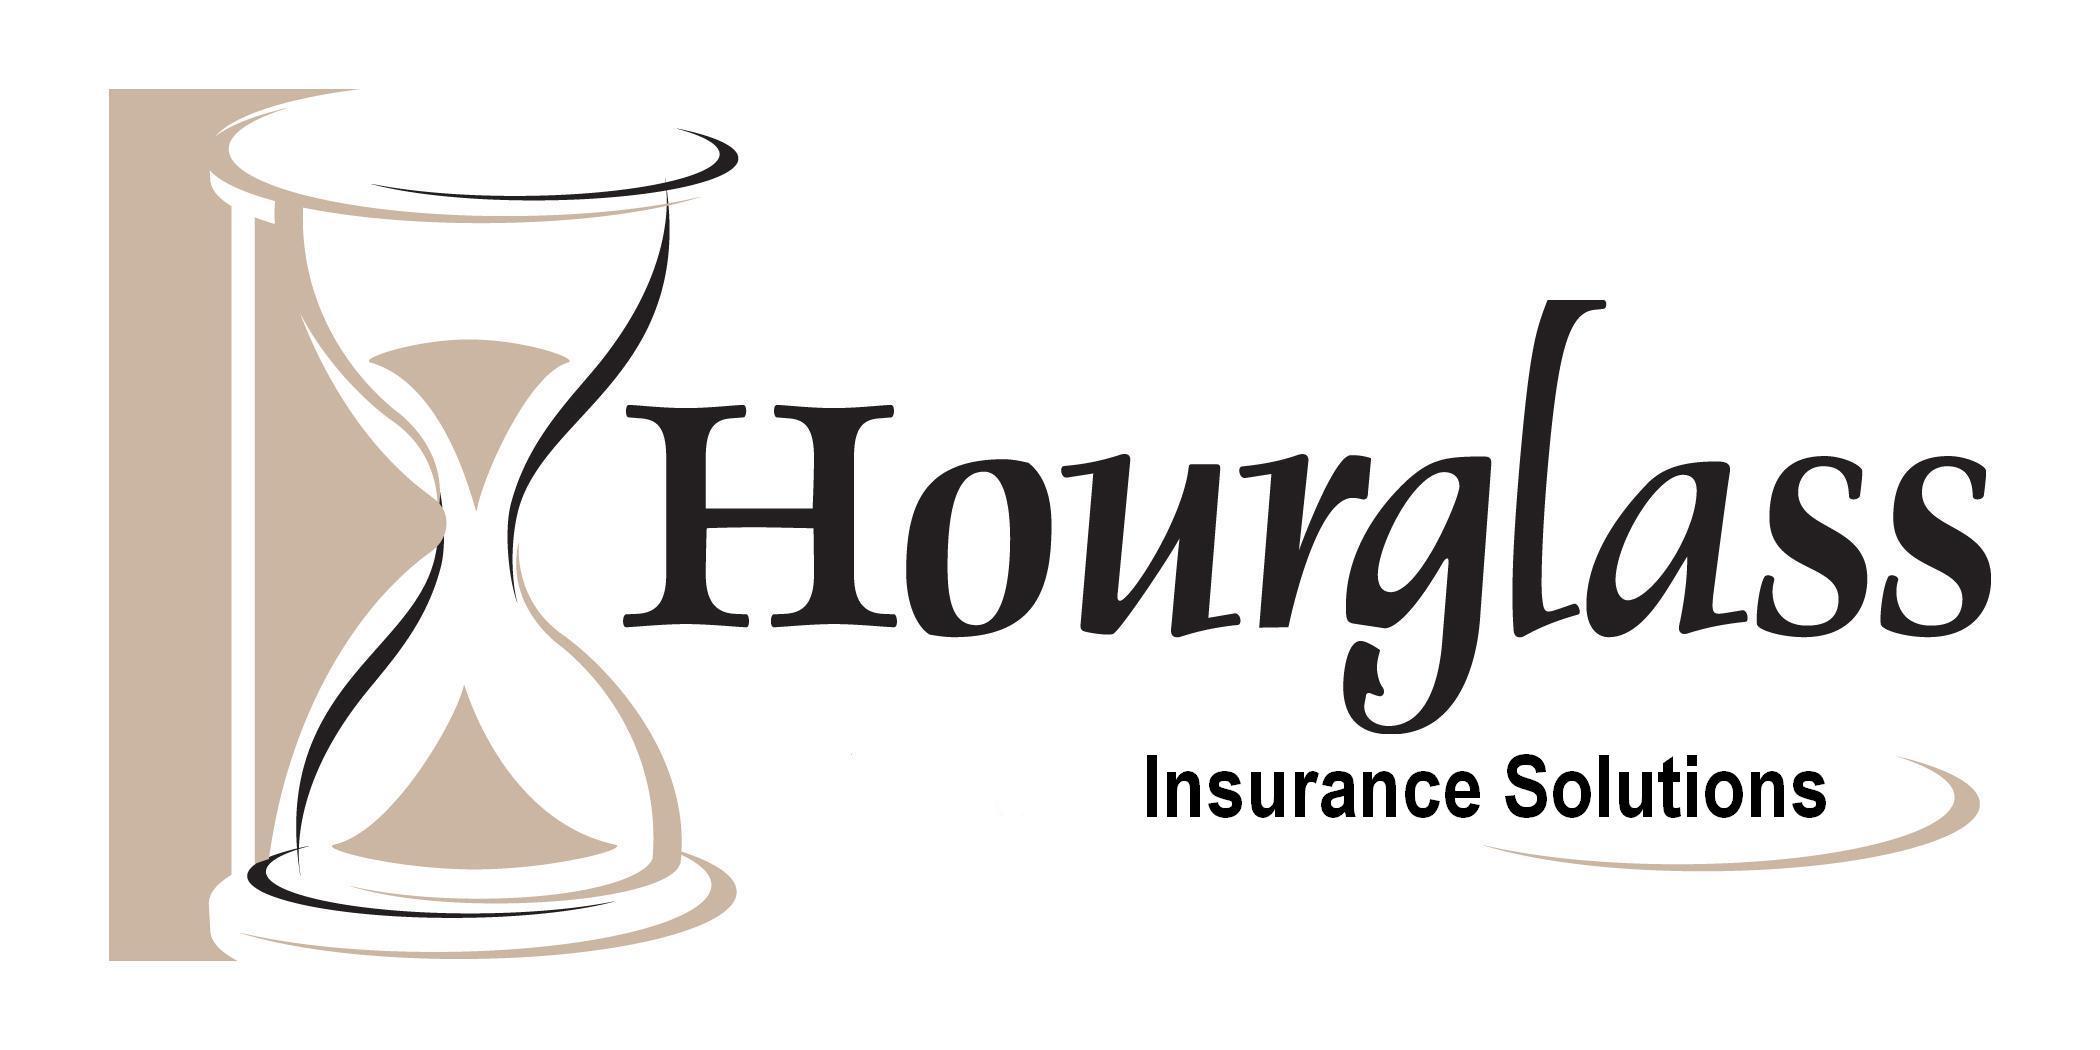 Hourglass P&C Sponsors Cycling Team